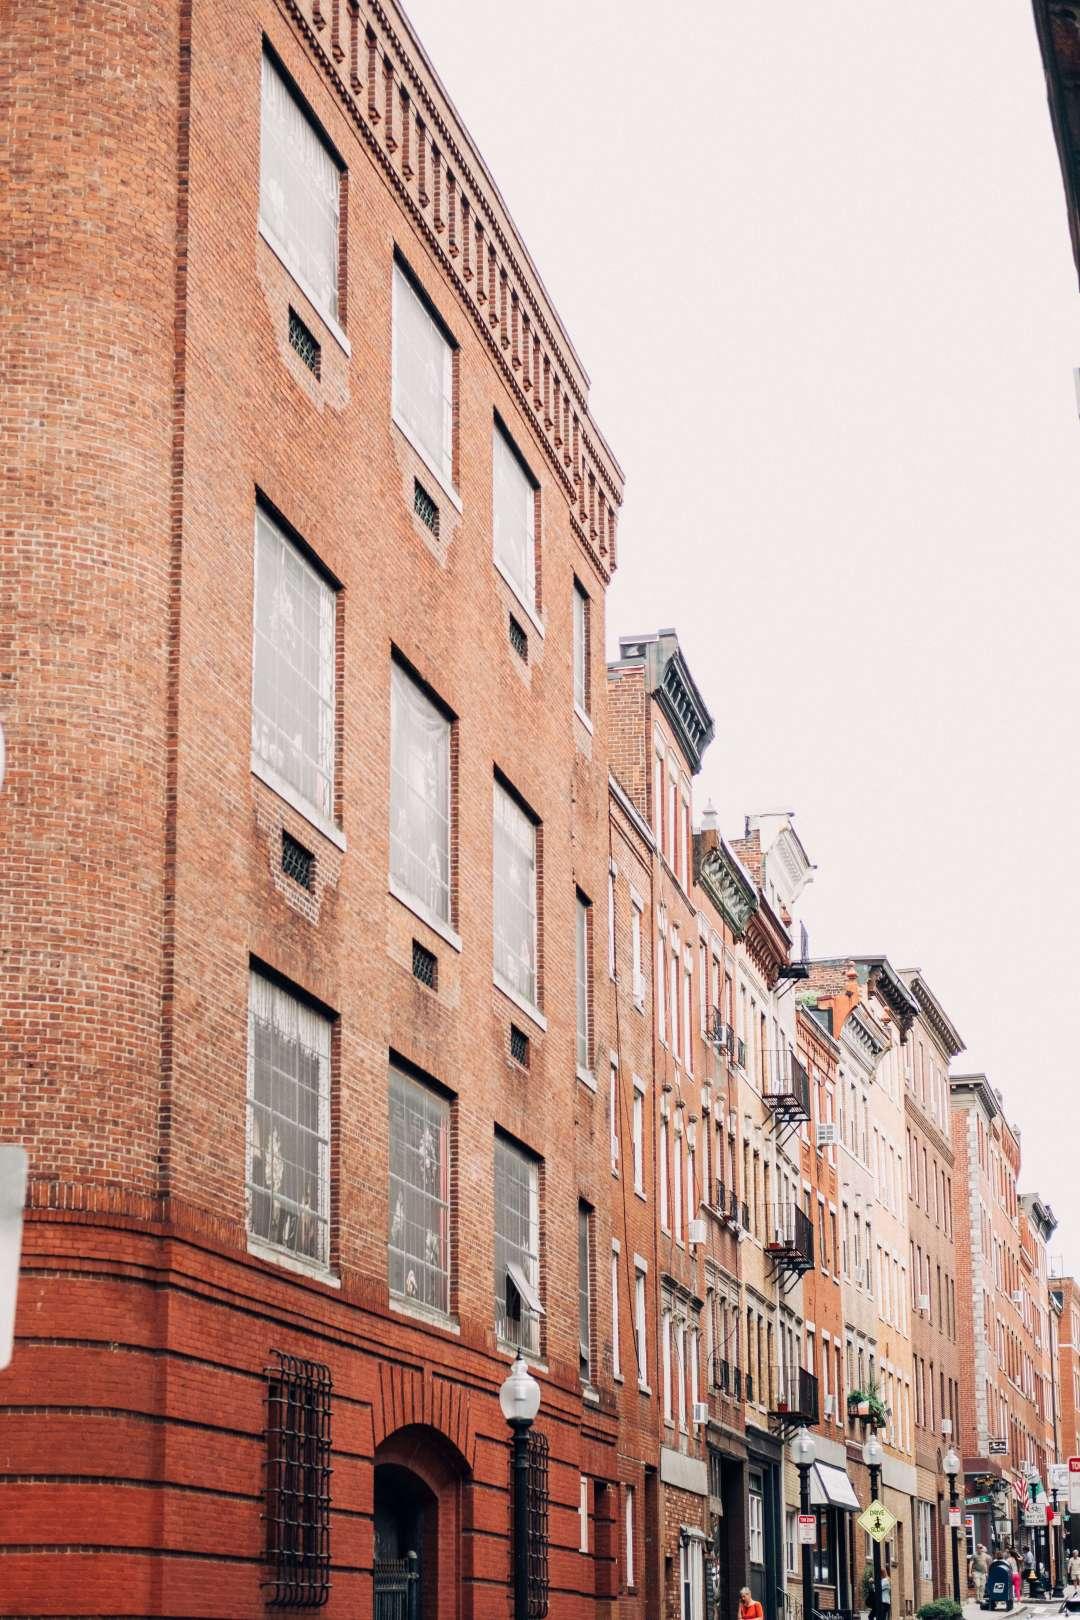 Boston Brick Buildings in a row